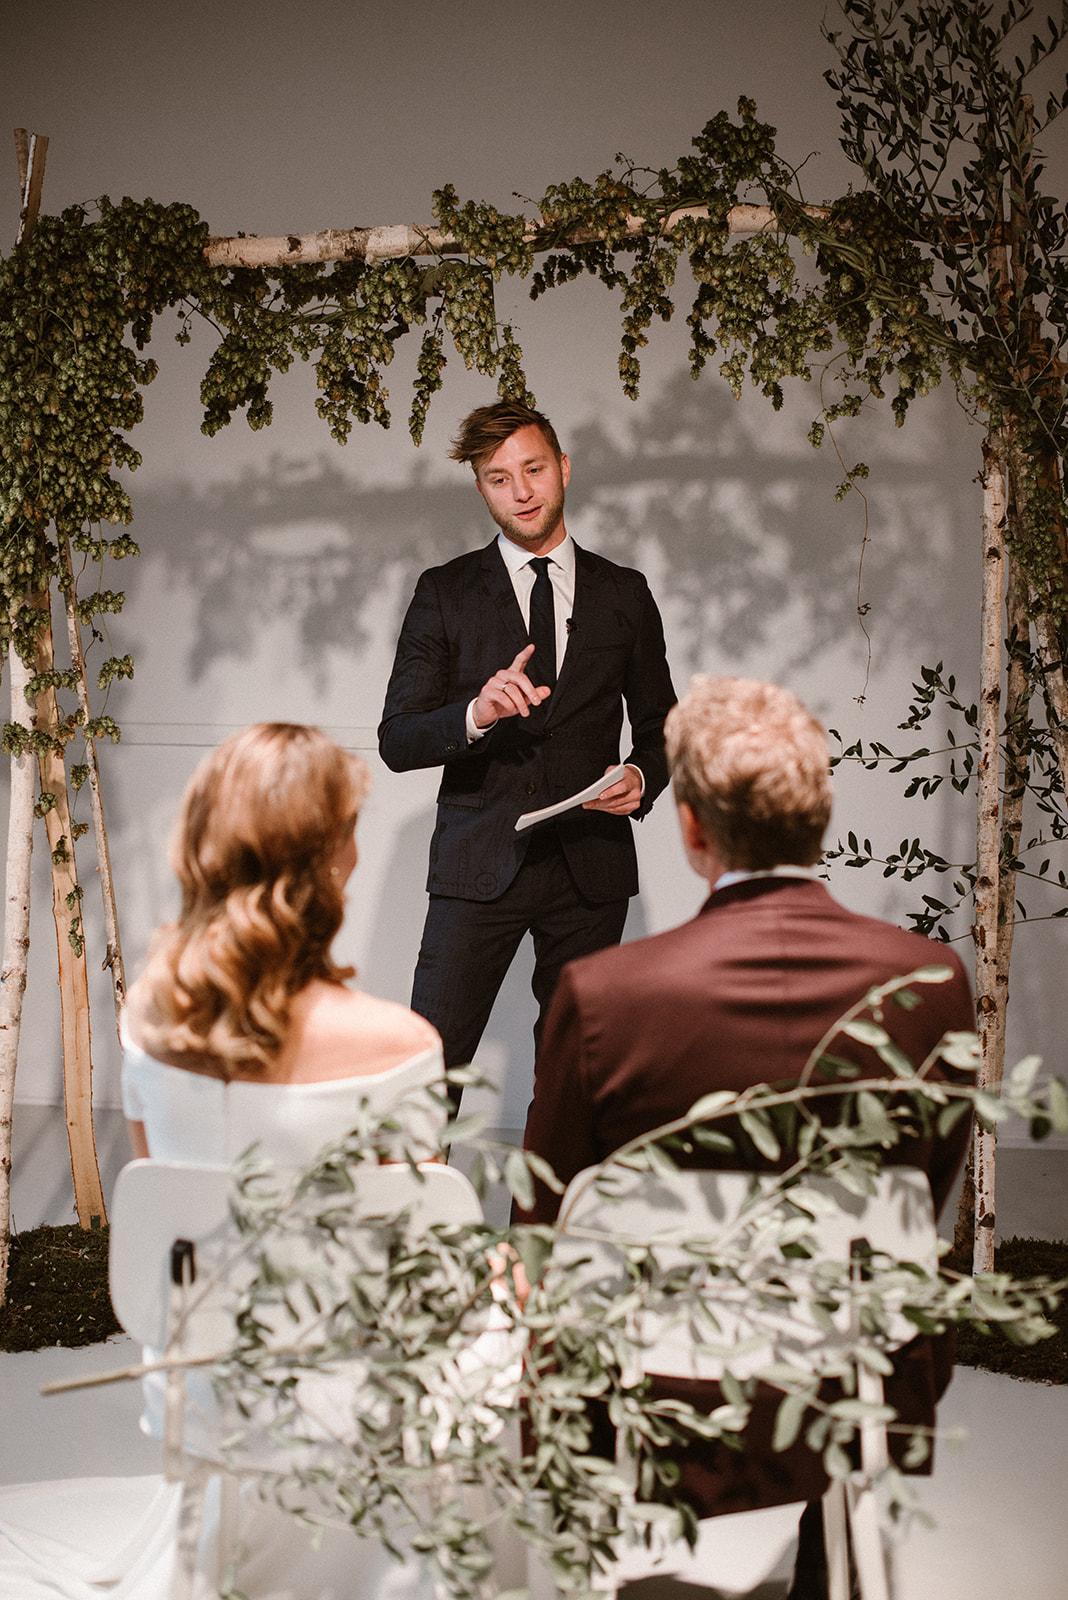 apbloem florist Amsterdam bloemist #girlsofhonour #portrait #bruiloft #trouwen #event #love #liefde #wedding #hotel #itsallmagic #theadventurebegins #weddingday #weddingstyling #weddinggoals #bruid #bride